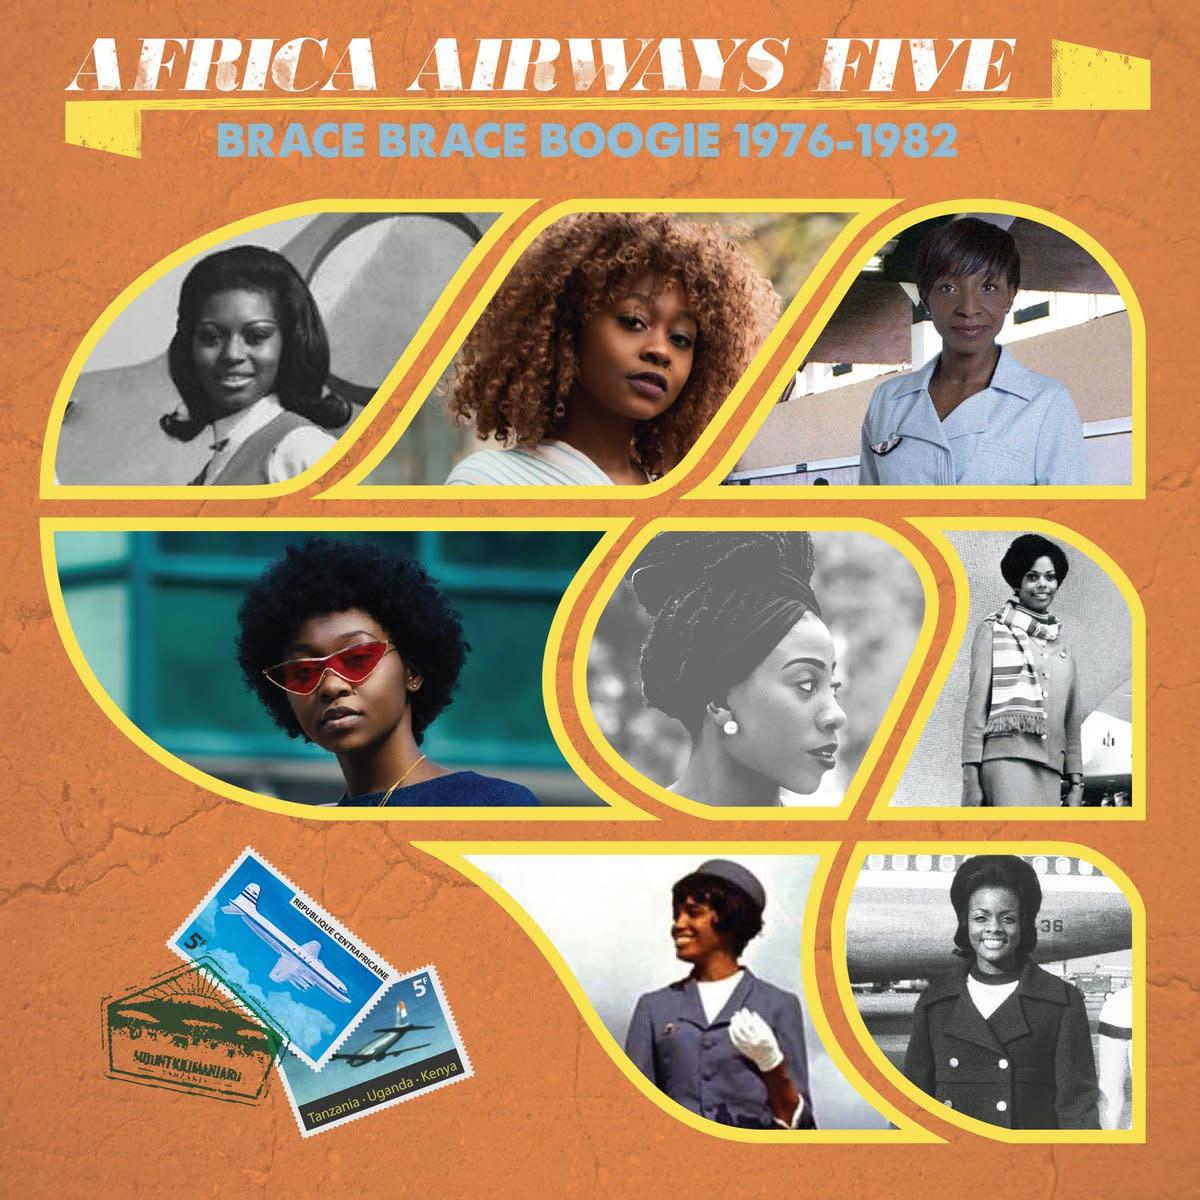 Africa Seven Various - Africa Airways Five (Brace Brace Boogie 1976 - 1982)